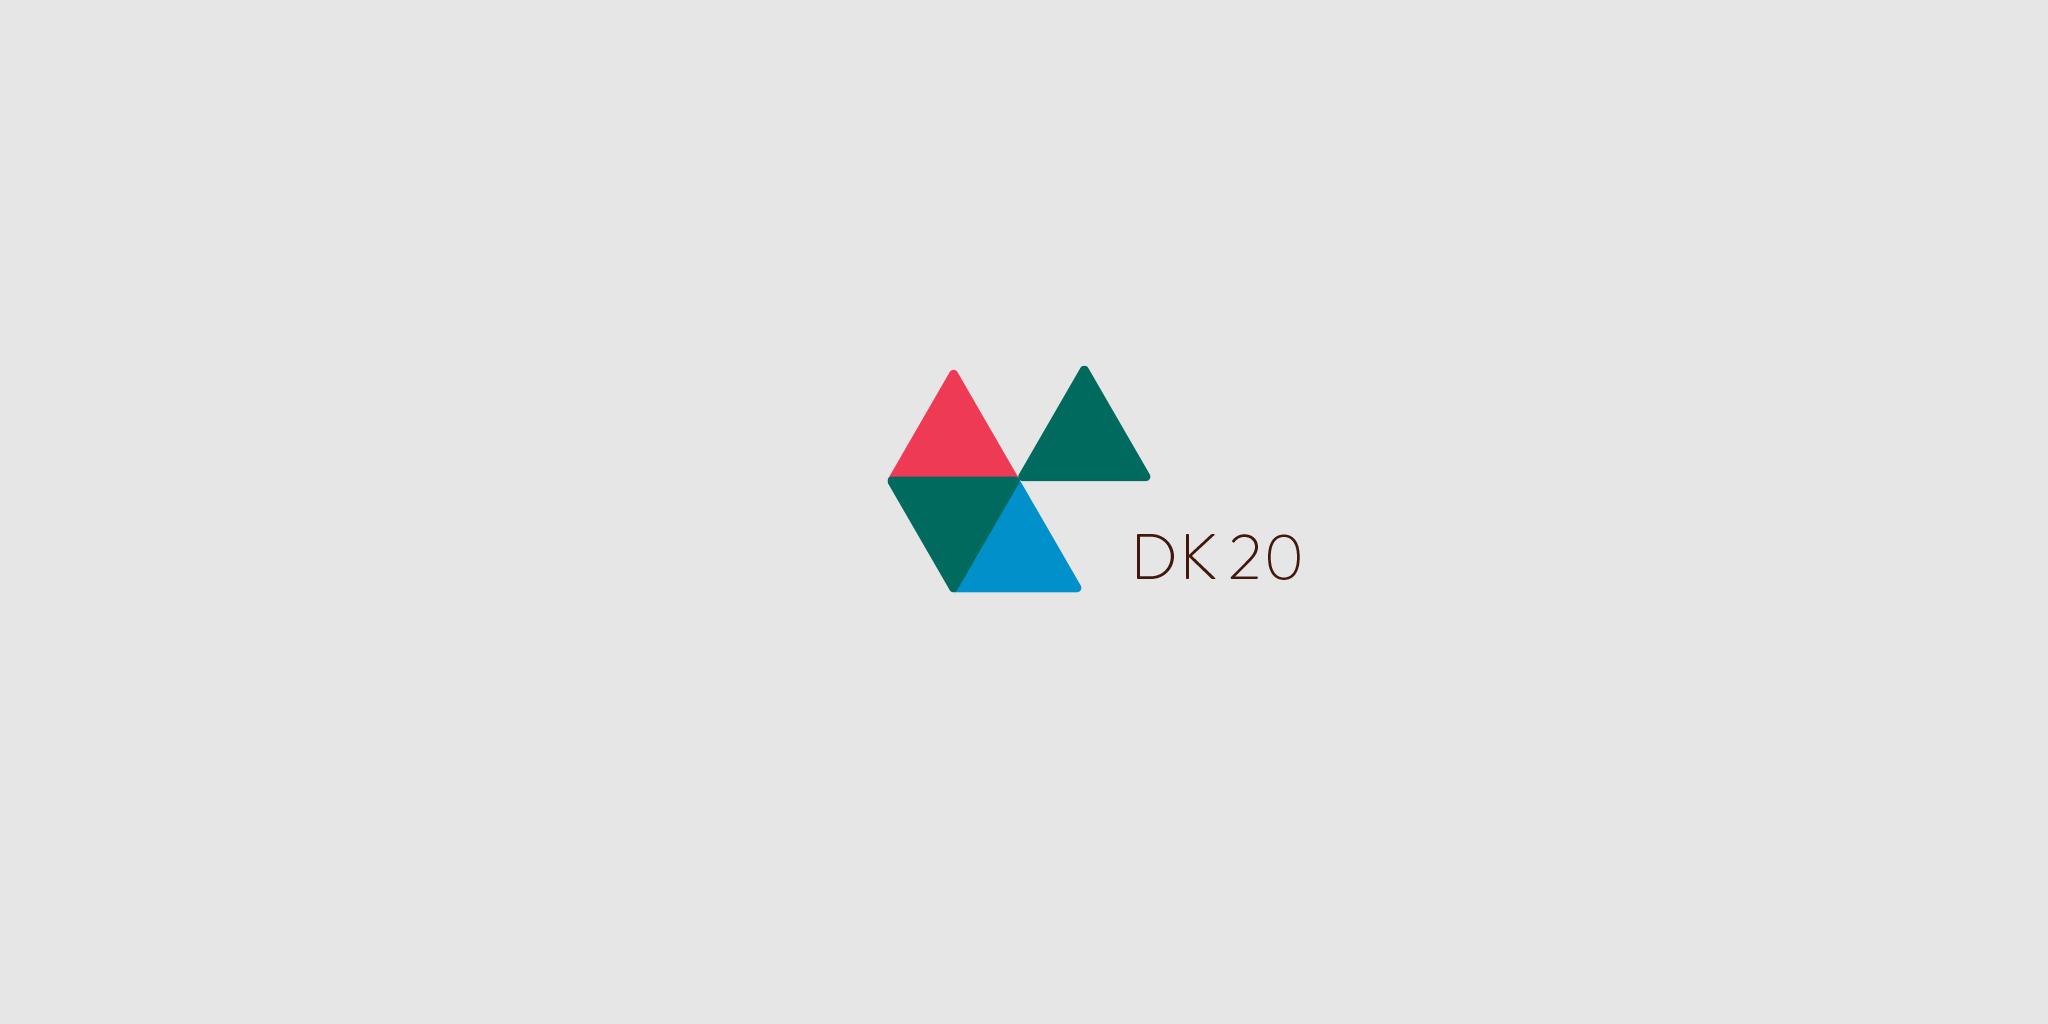 01_DK20.png